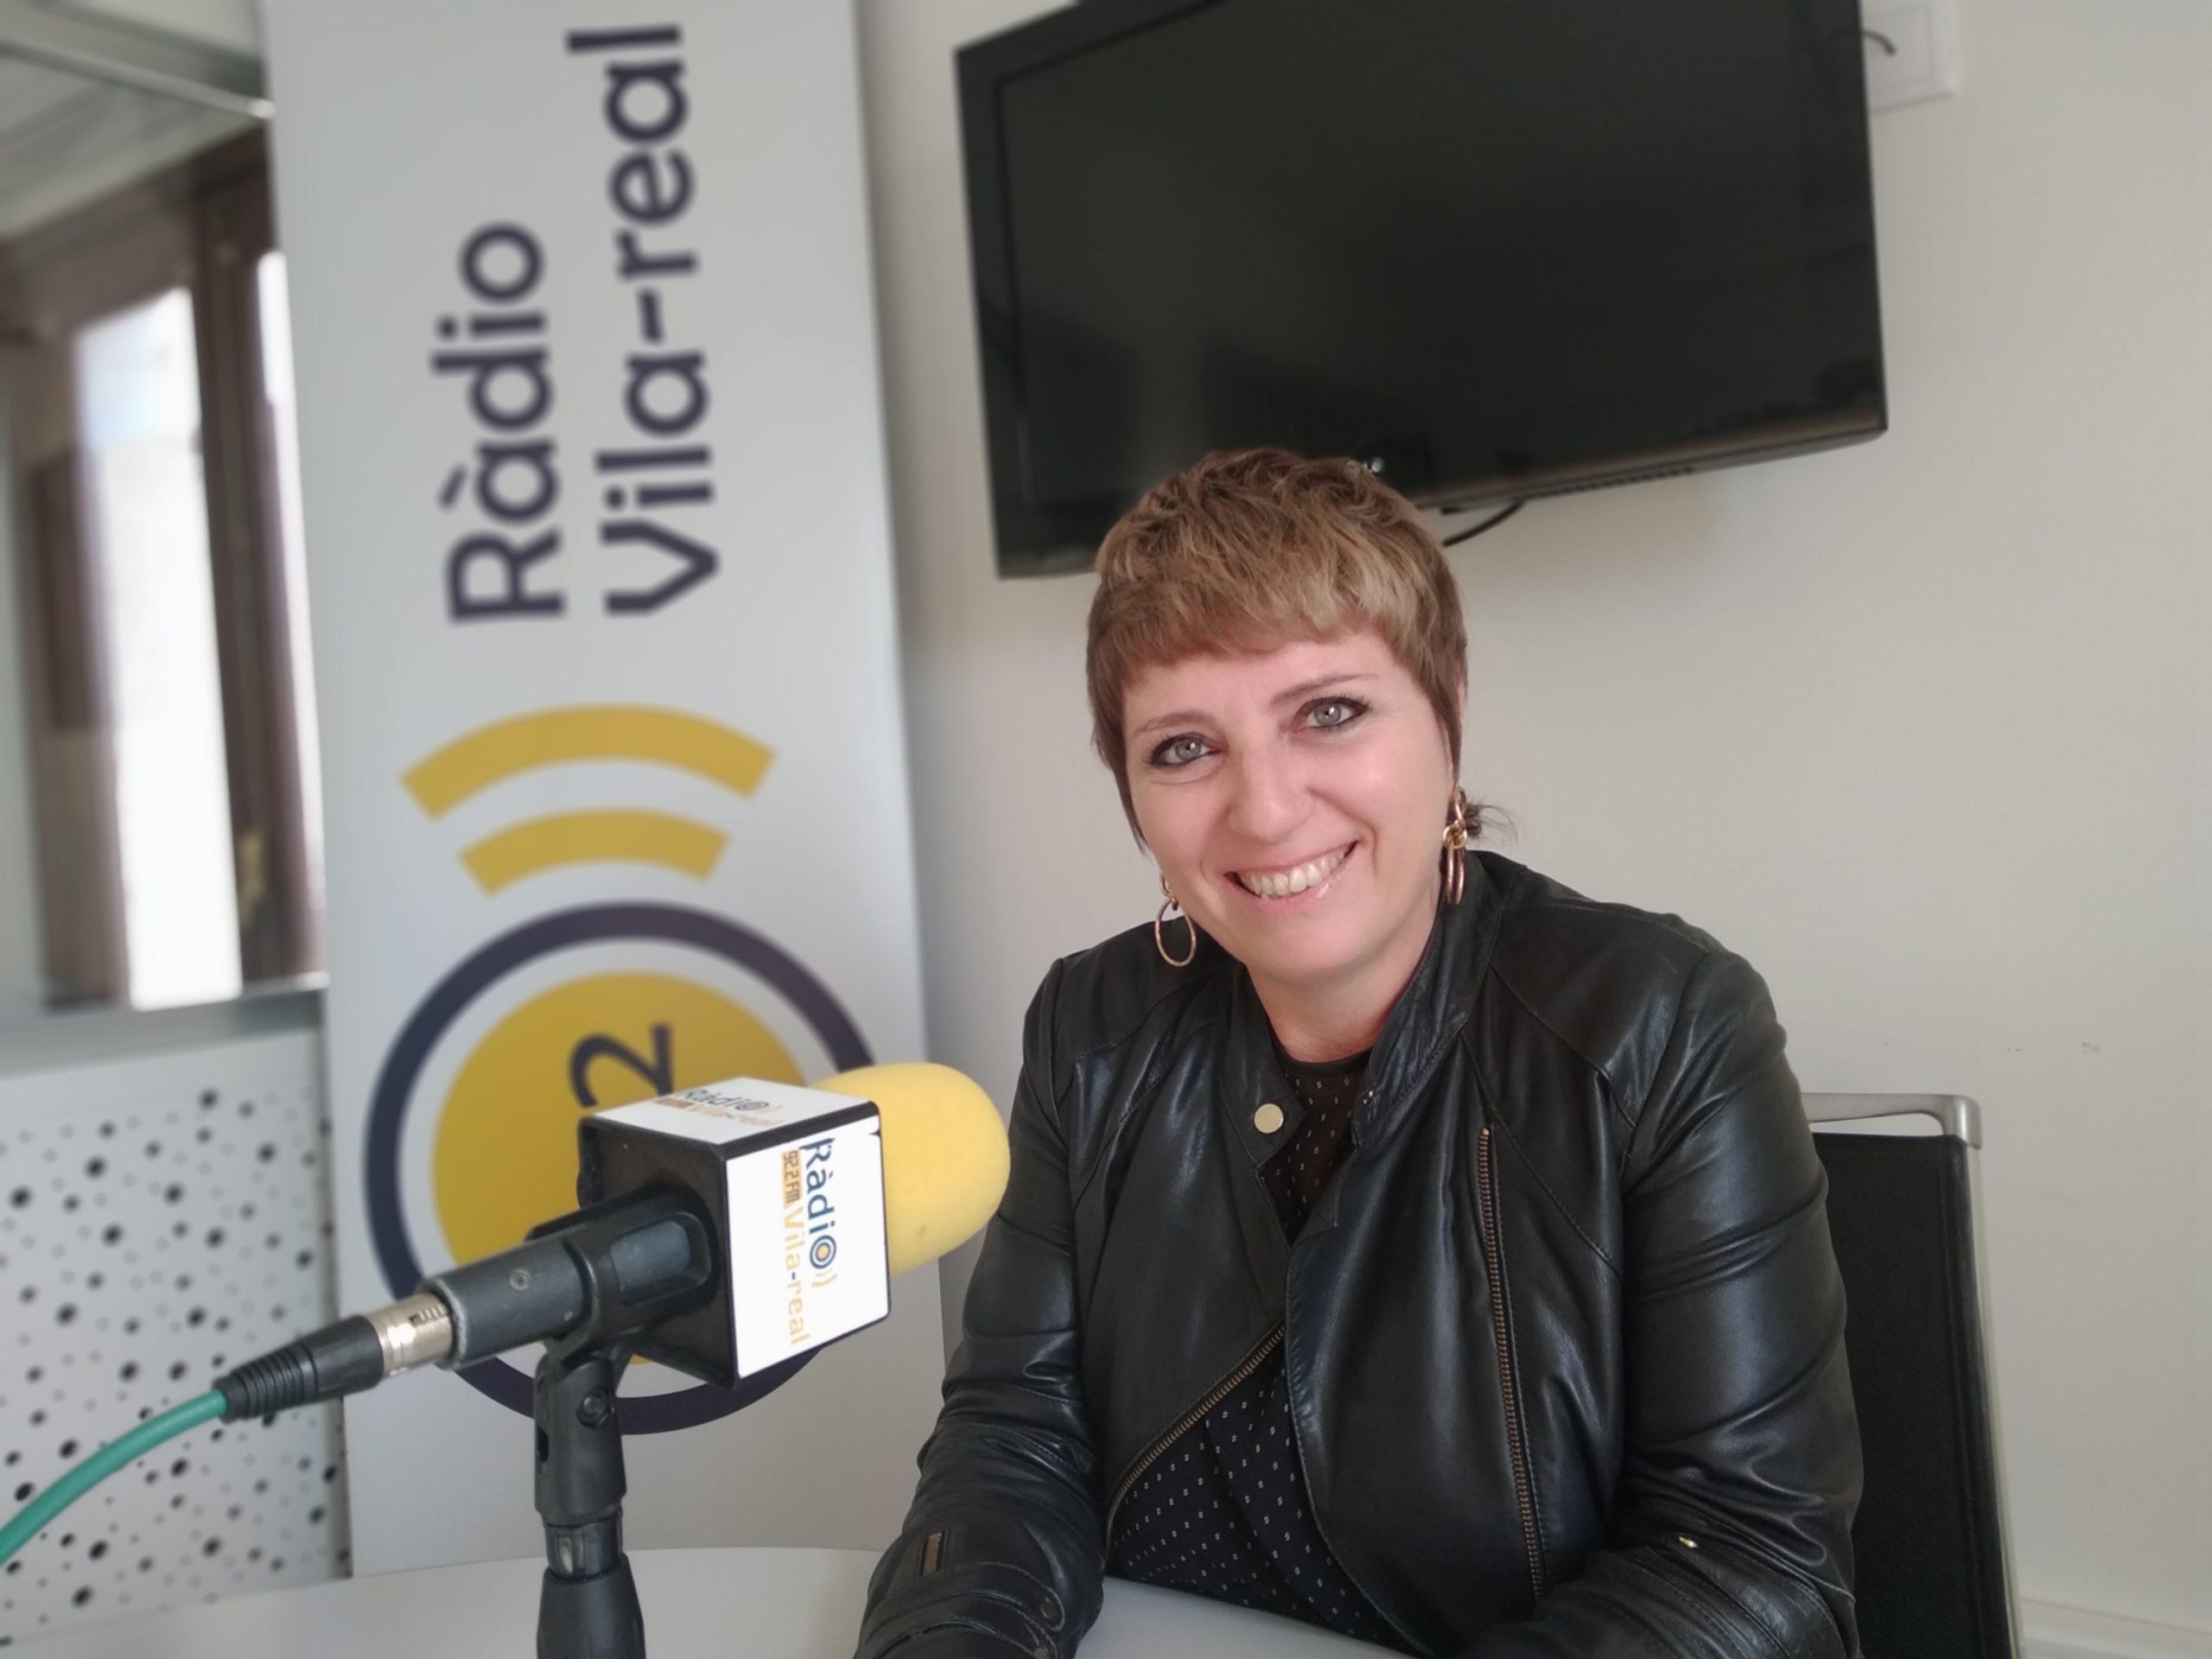 Entrevista a la diputada provincial del PP, Elena Vicente-Ruiz